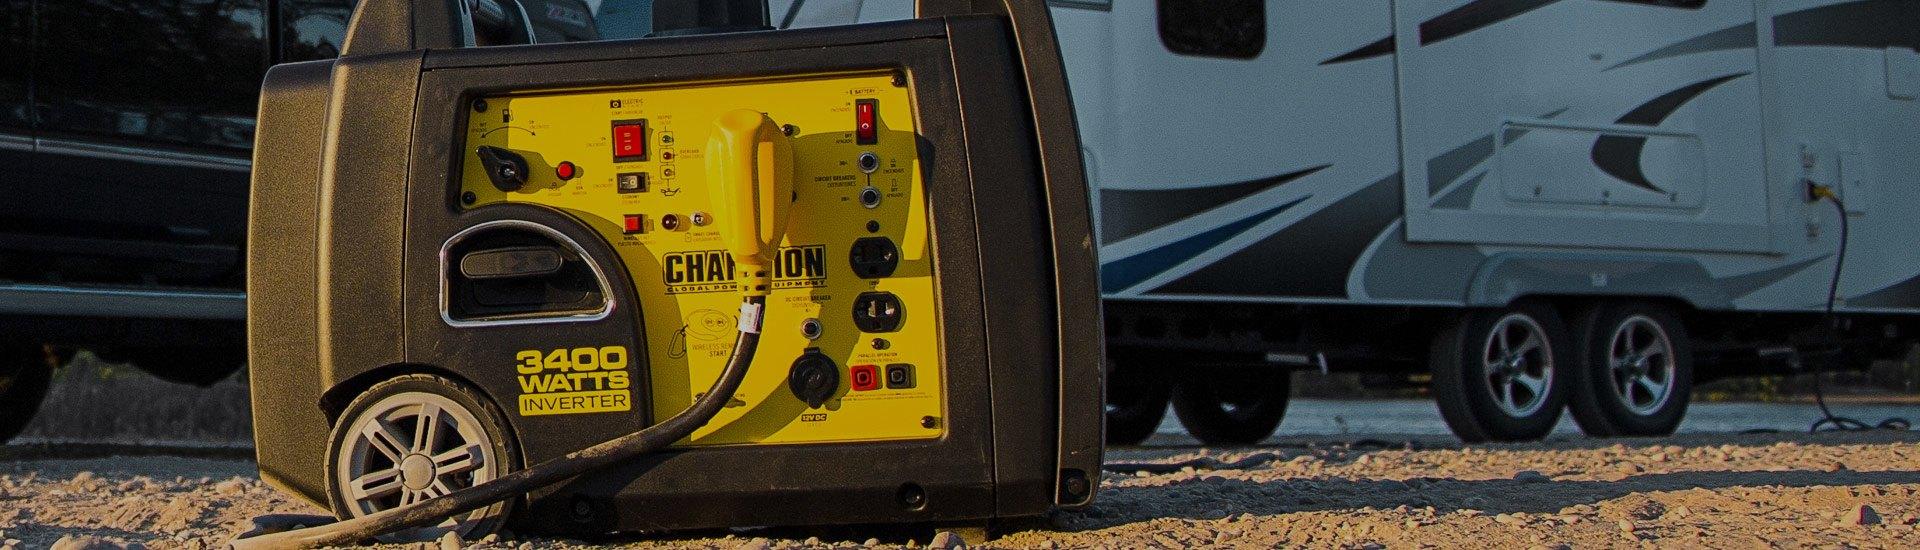 RV Parts & Accessories | RV, Camper, Travel Trailer